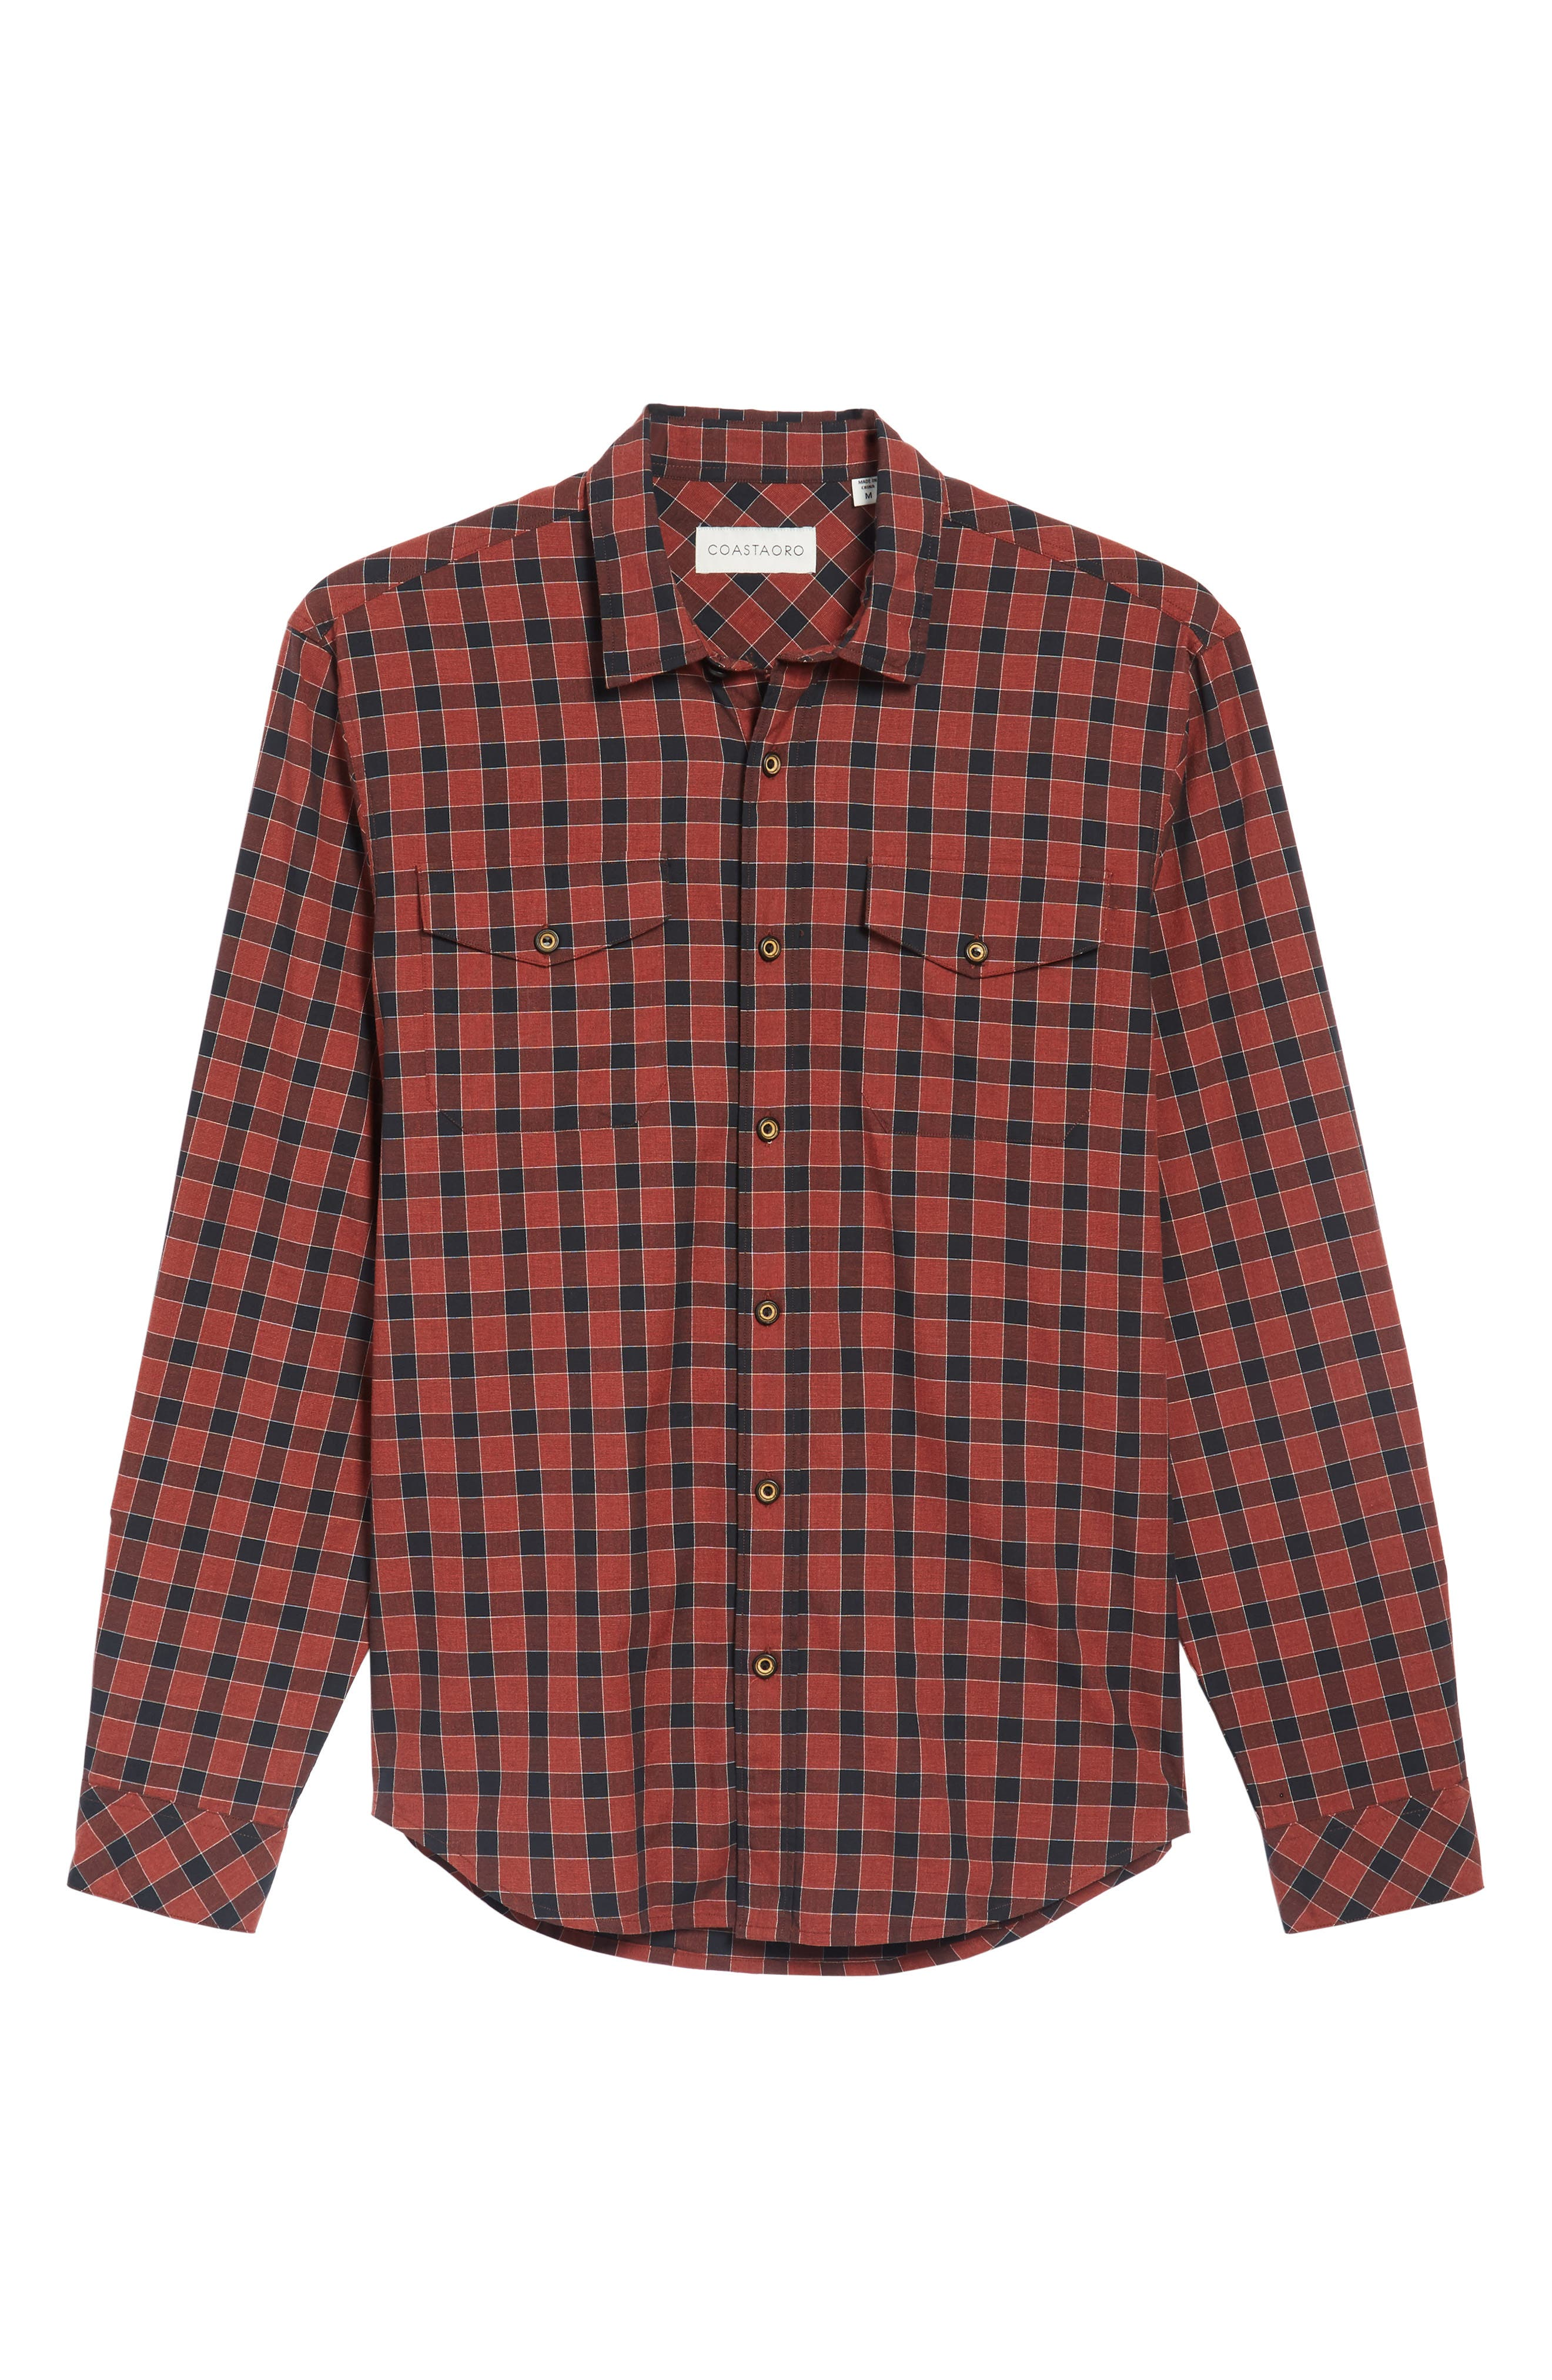 Lake Plaid Flannel Shirt,                             Alternate thumbnail 6, color,                             Red